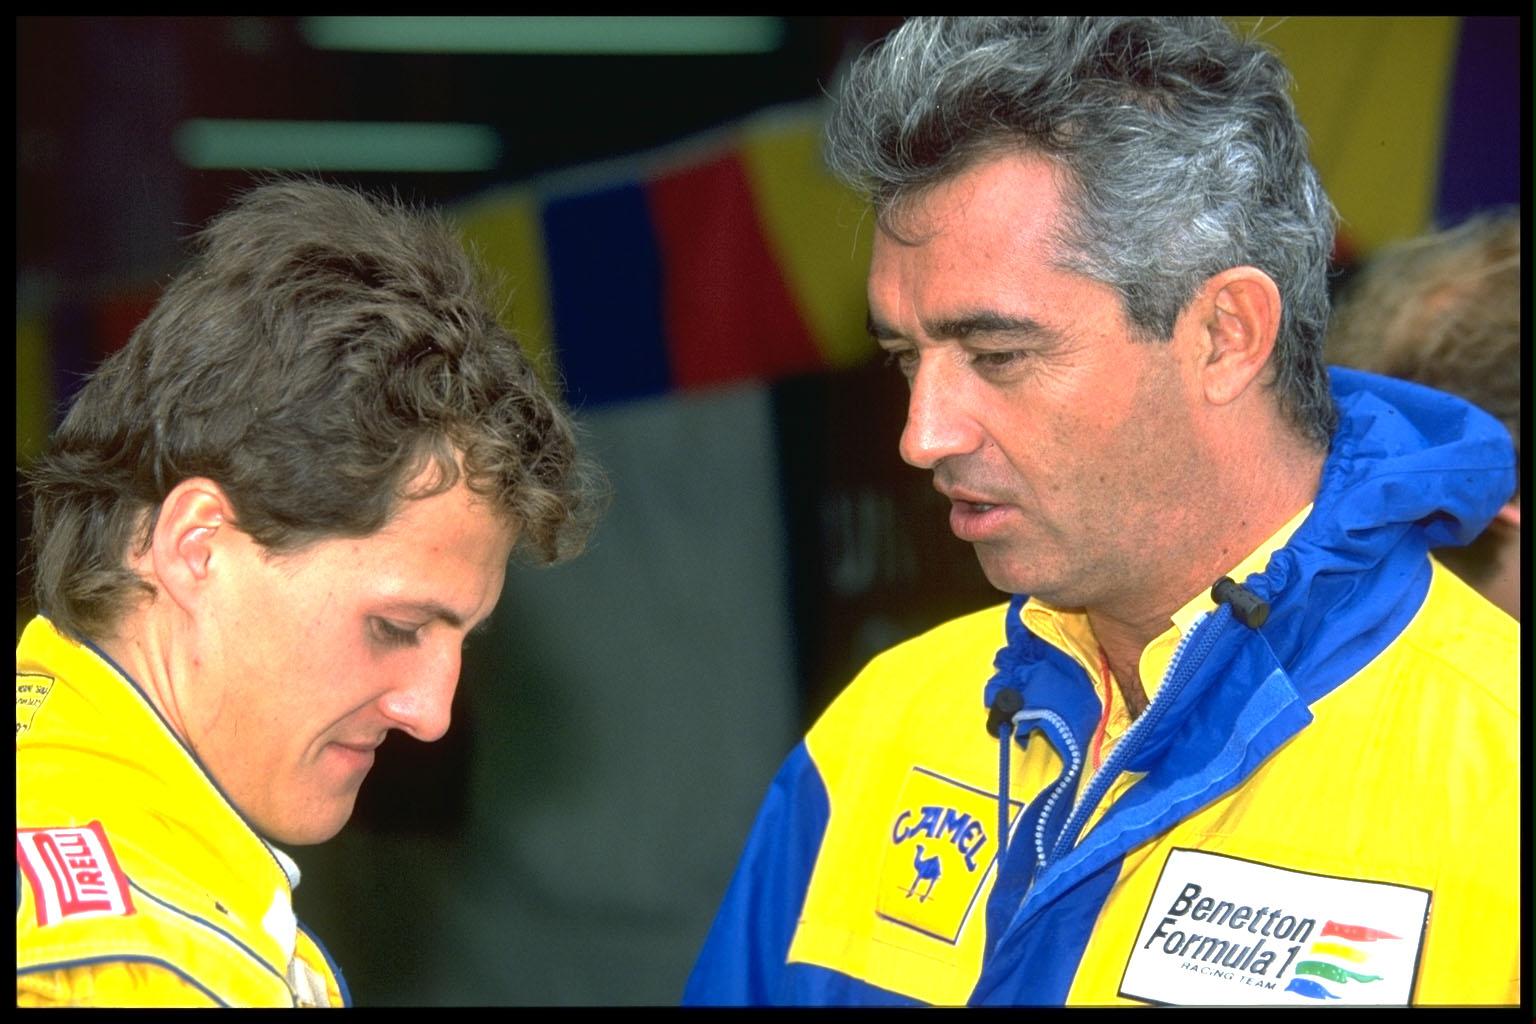 Michael Schumacher Flavio Briatore 1991